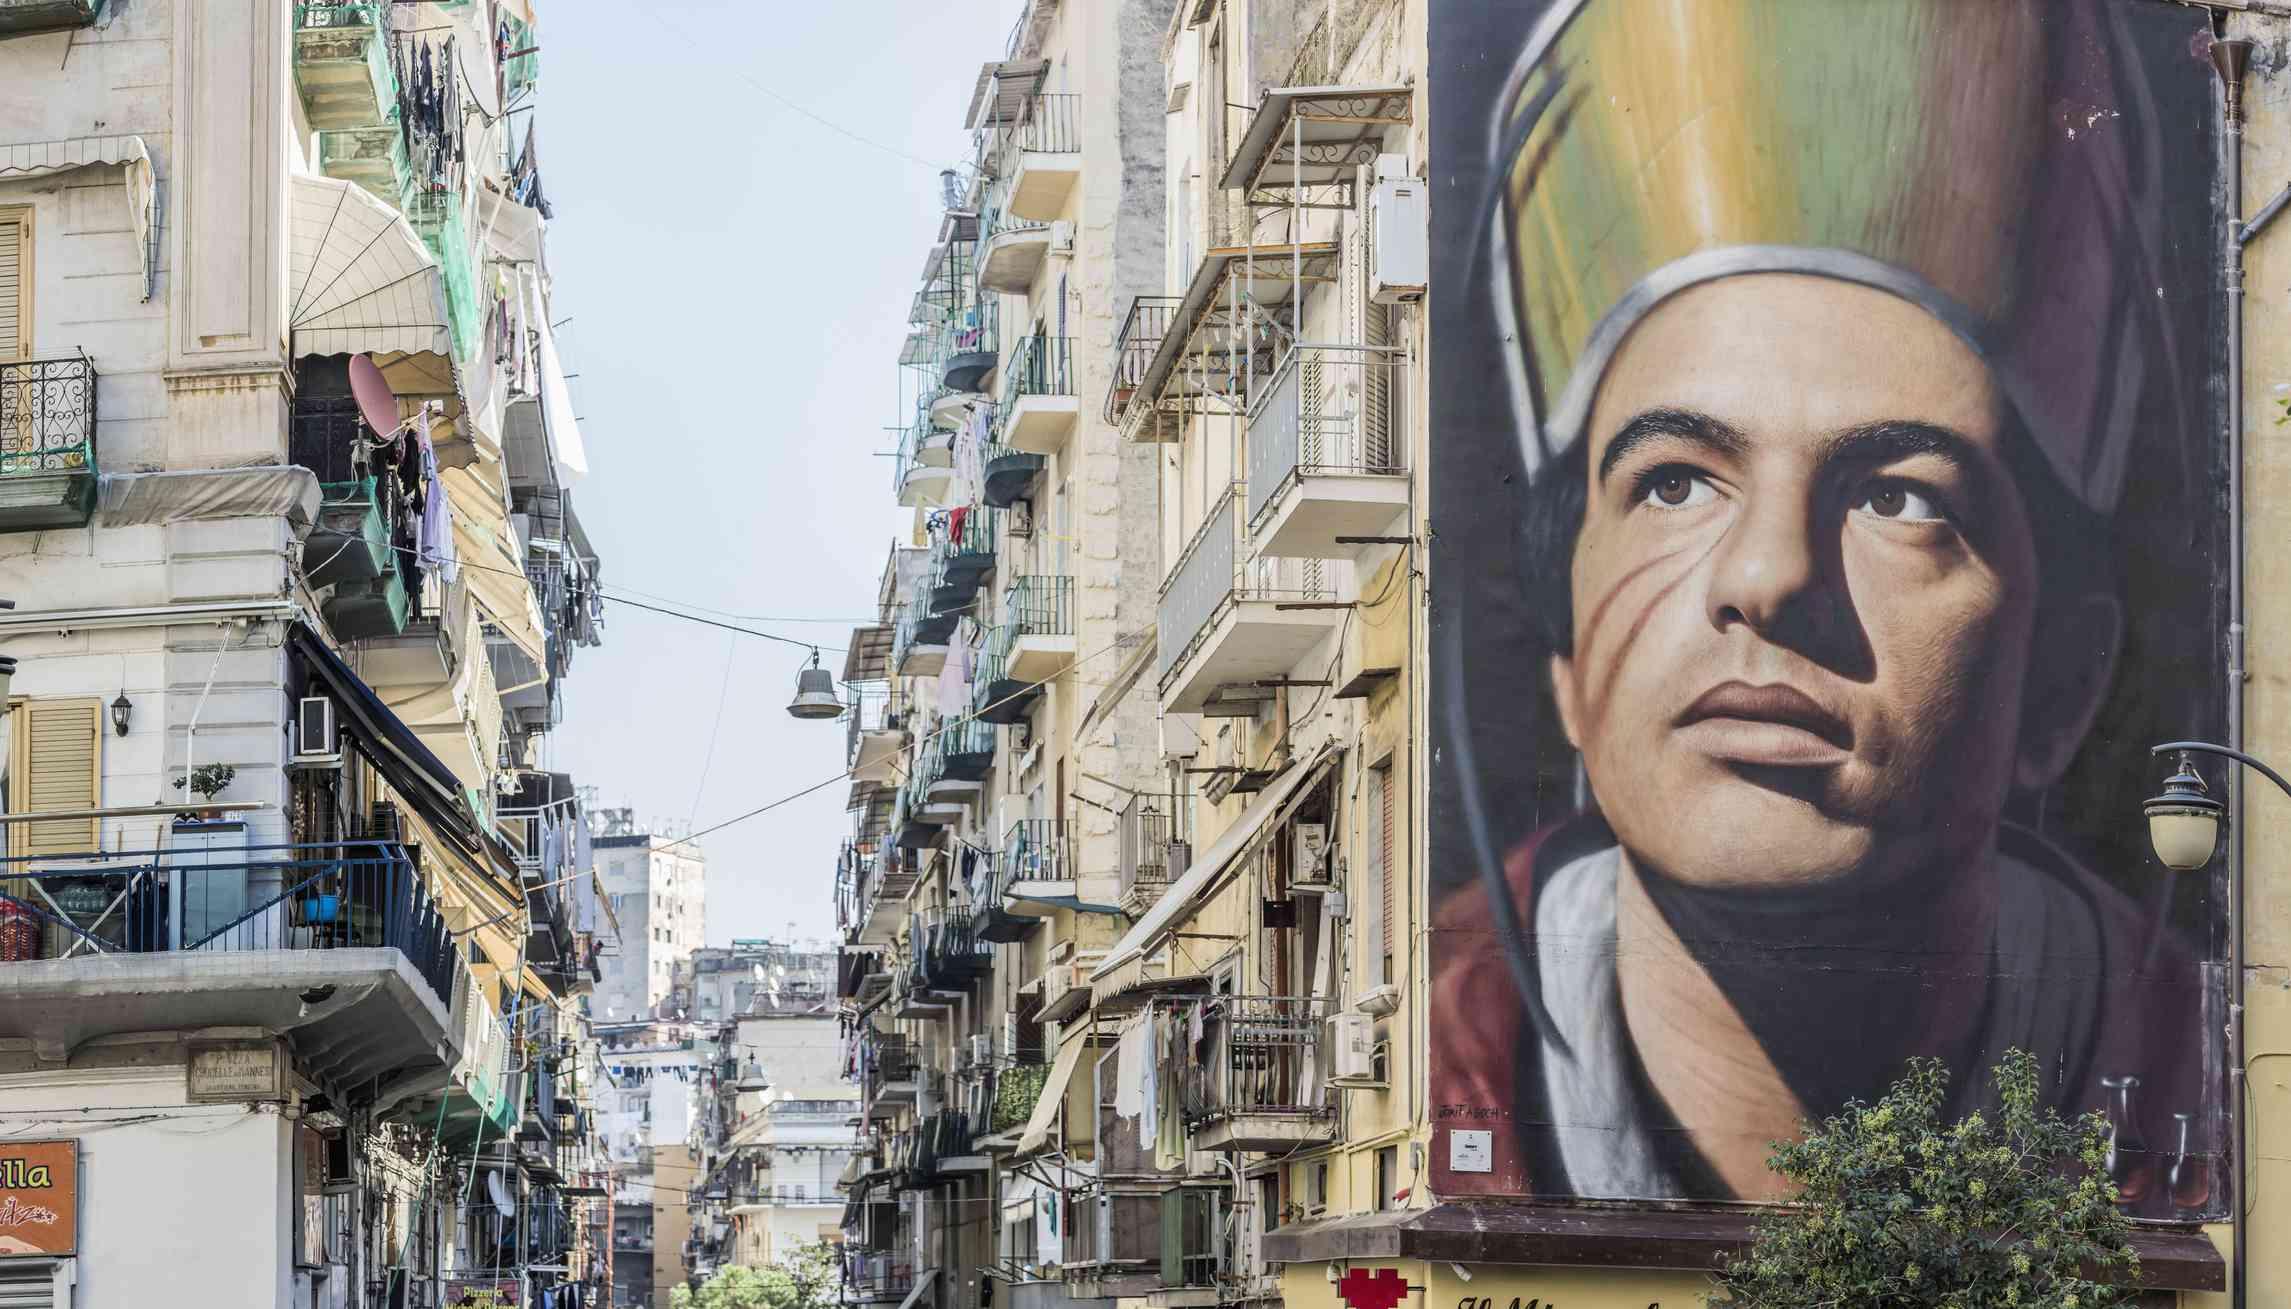 San Gennaro mural in Naples